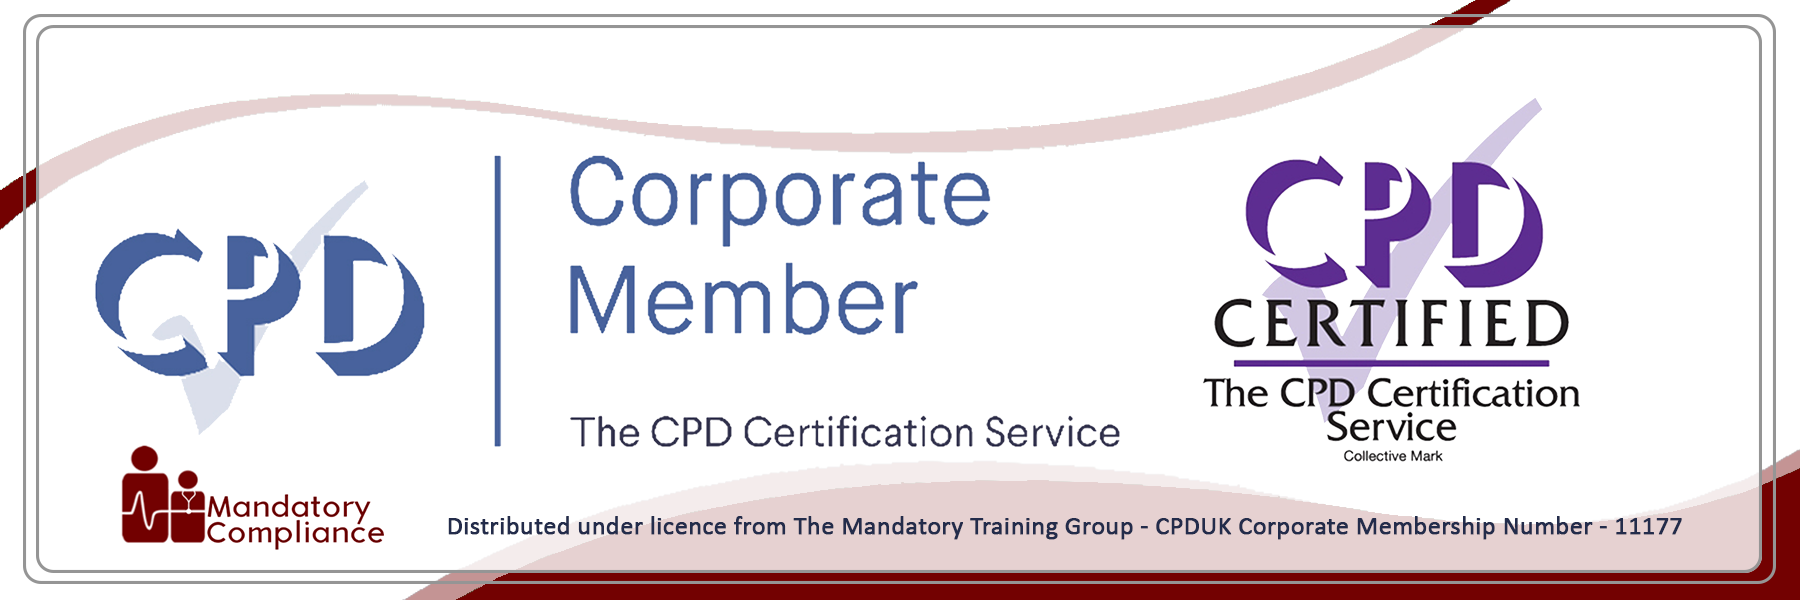 Understanding the Safe Handling of Medication - Online Training Courses - Mandatory Compliance UK -